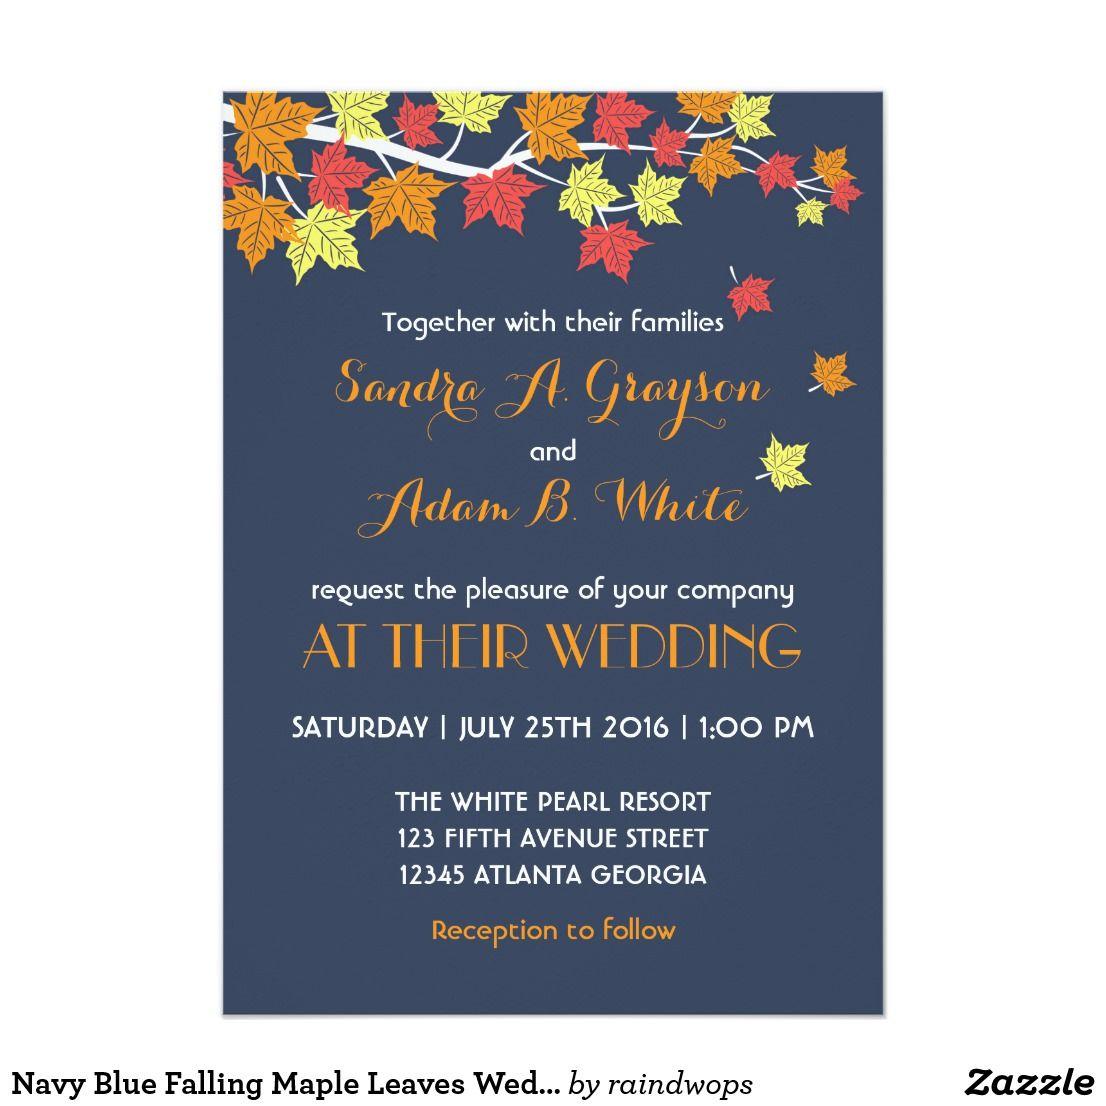 Navy Blue Falling Maple Leaves Wedding Invitation | Pinterest ...